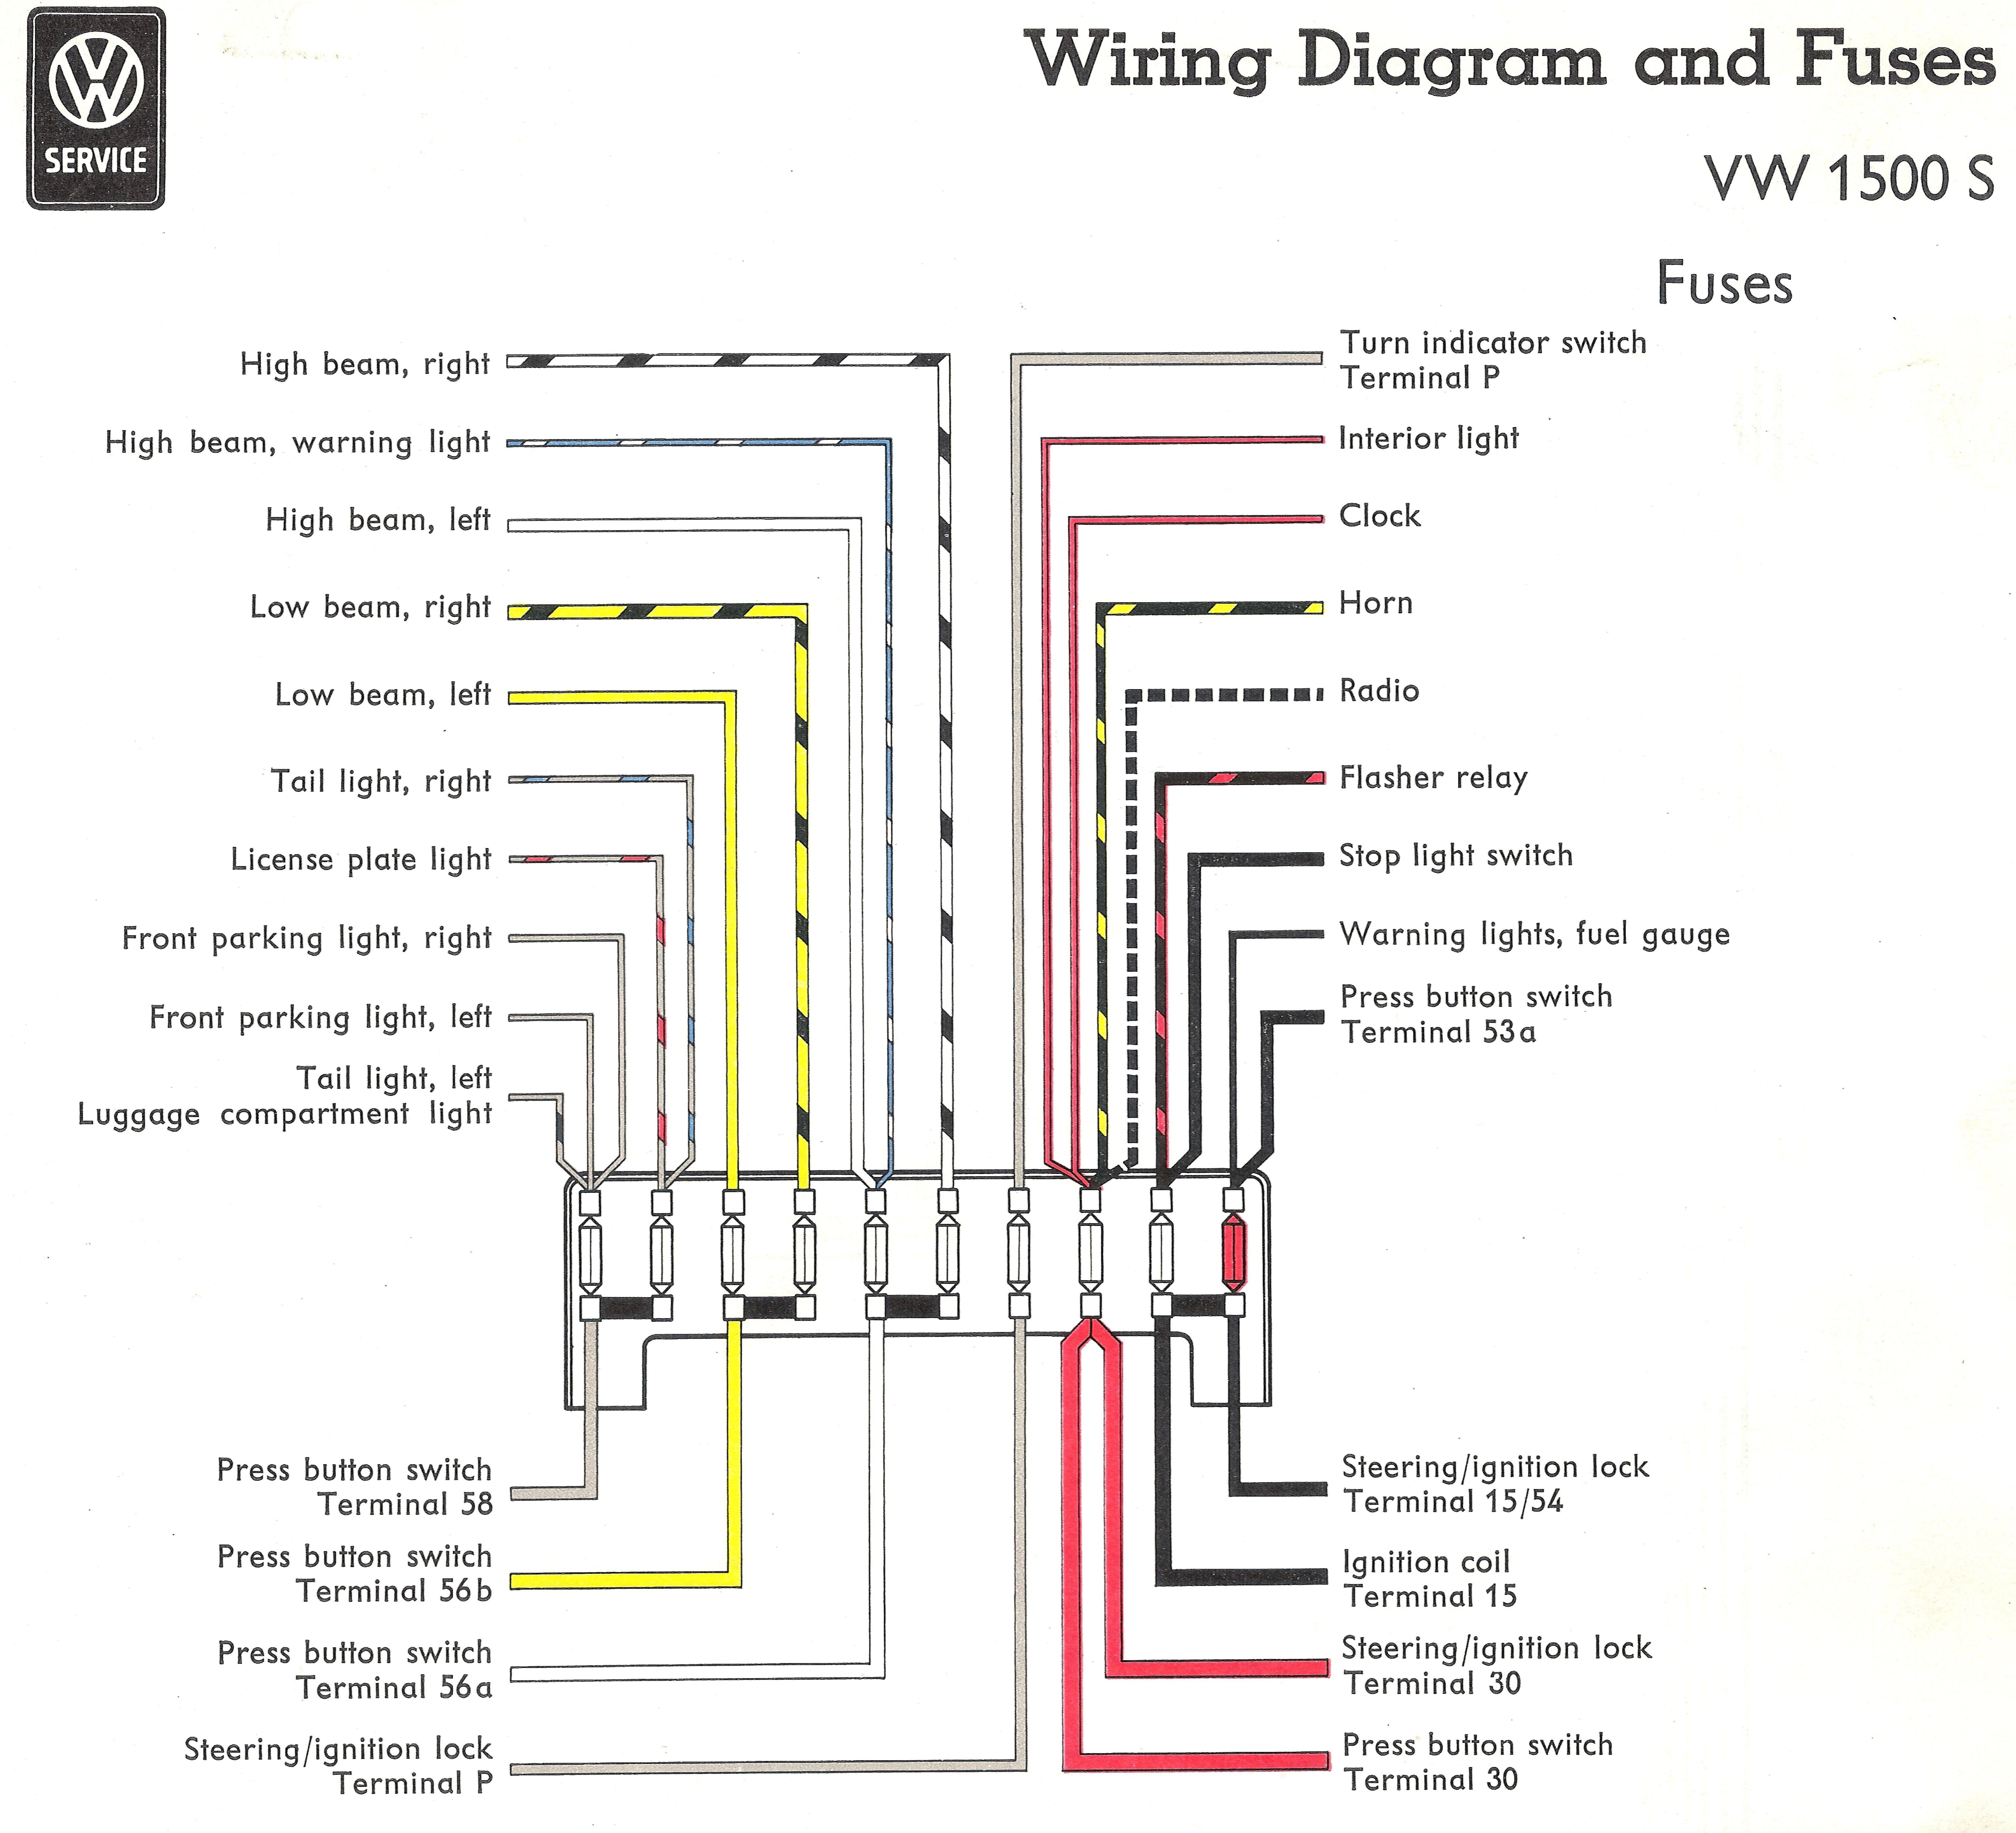 diagram] vw 1971 fuse diagram full version hd quality -  forddiagram.mariachiaragadda.it  mariachiaragadda.it